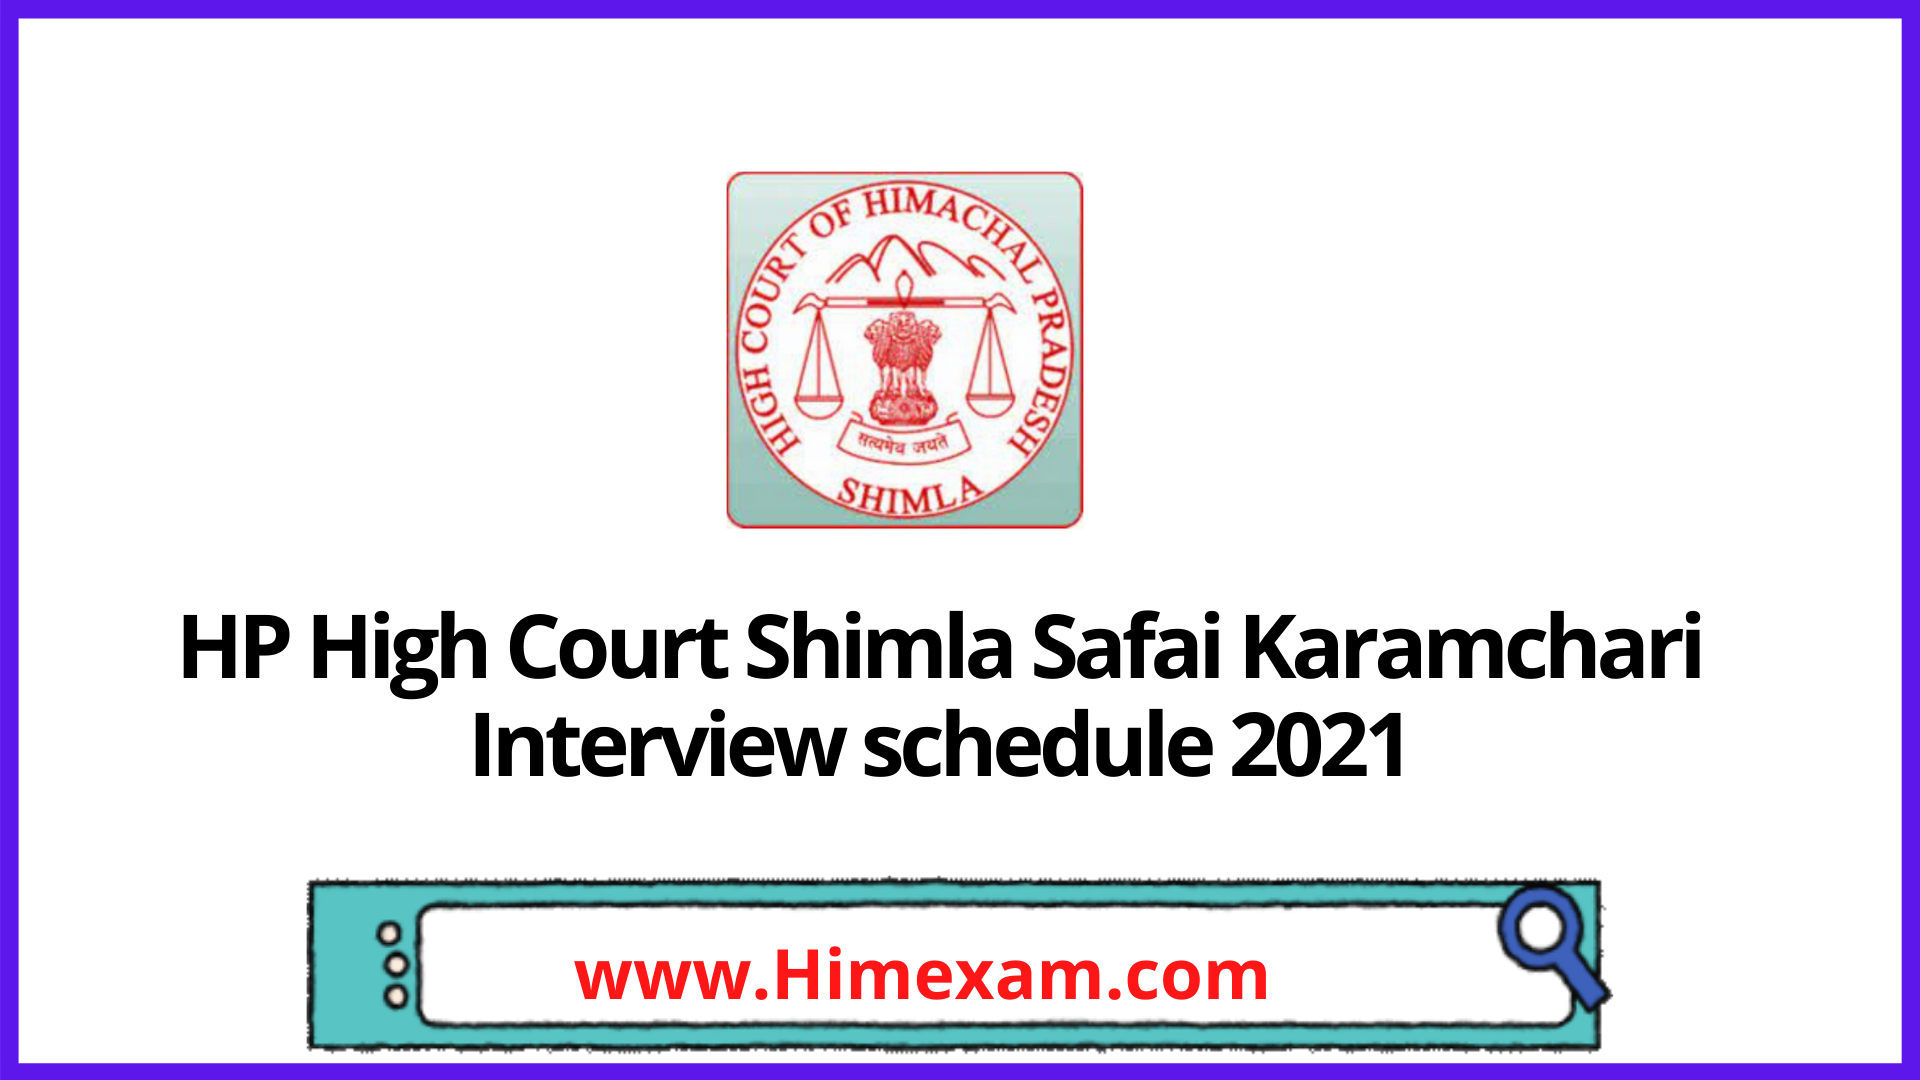 HP High Court Shimla Safai Karamchari Interview schedule 2021